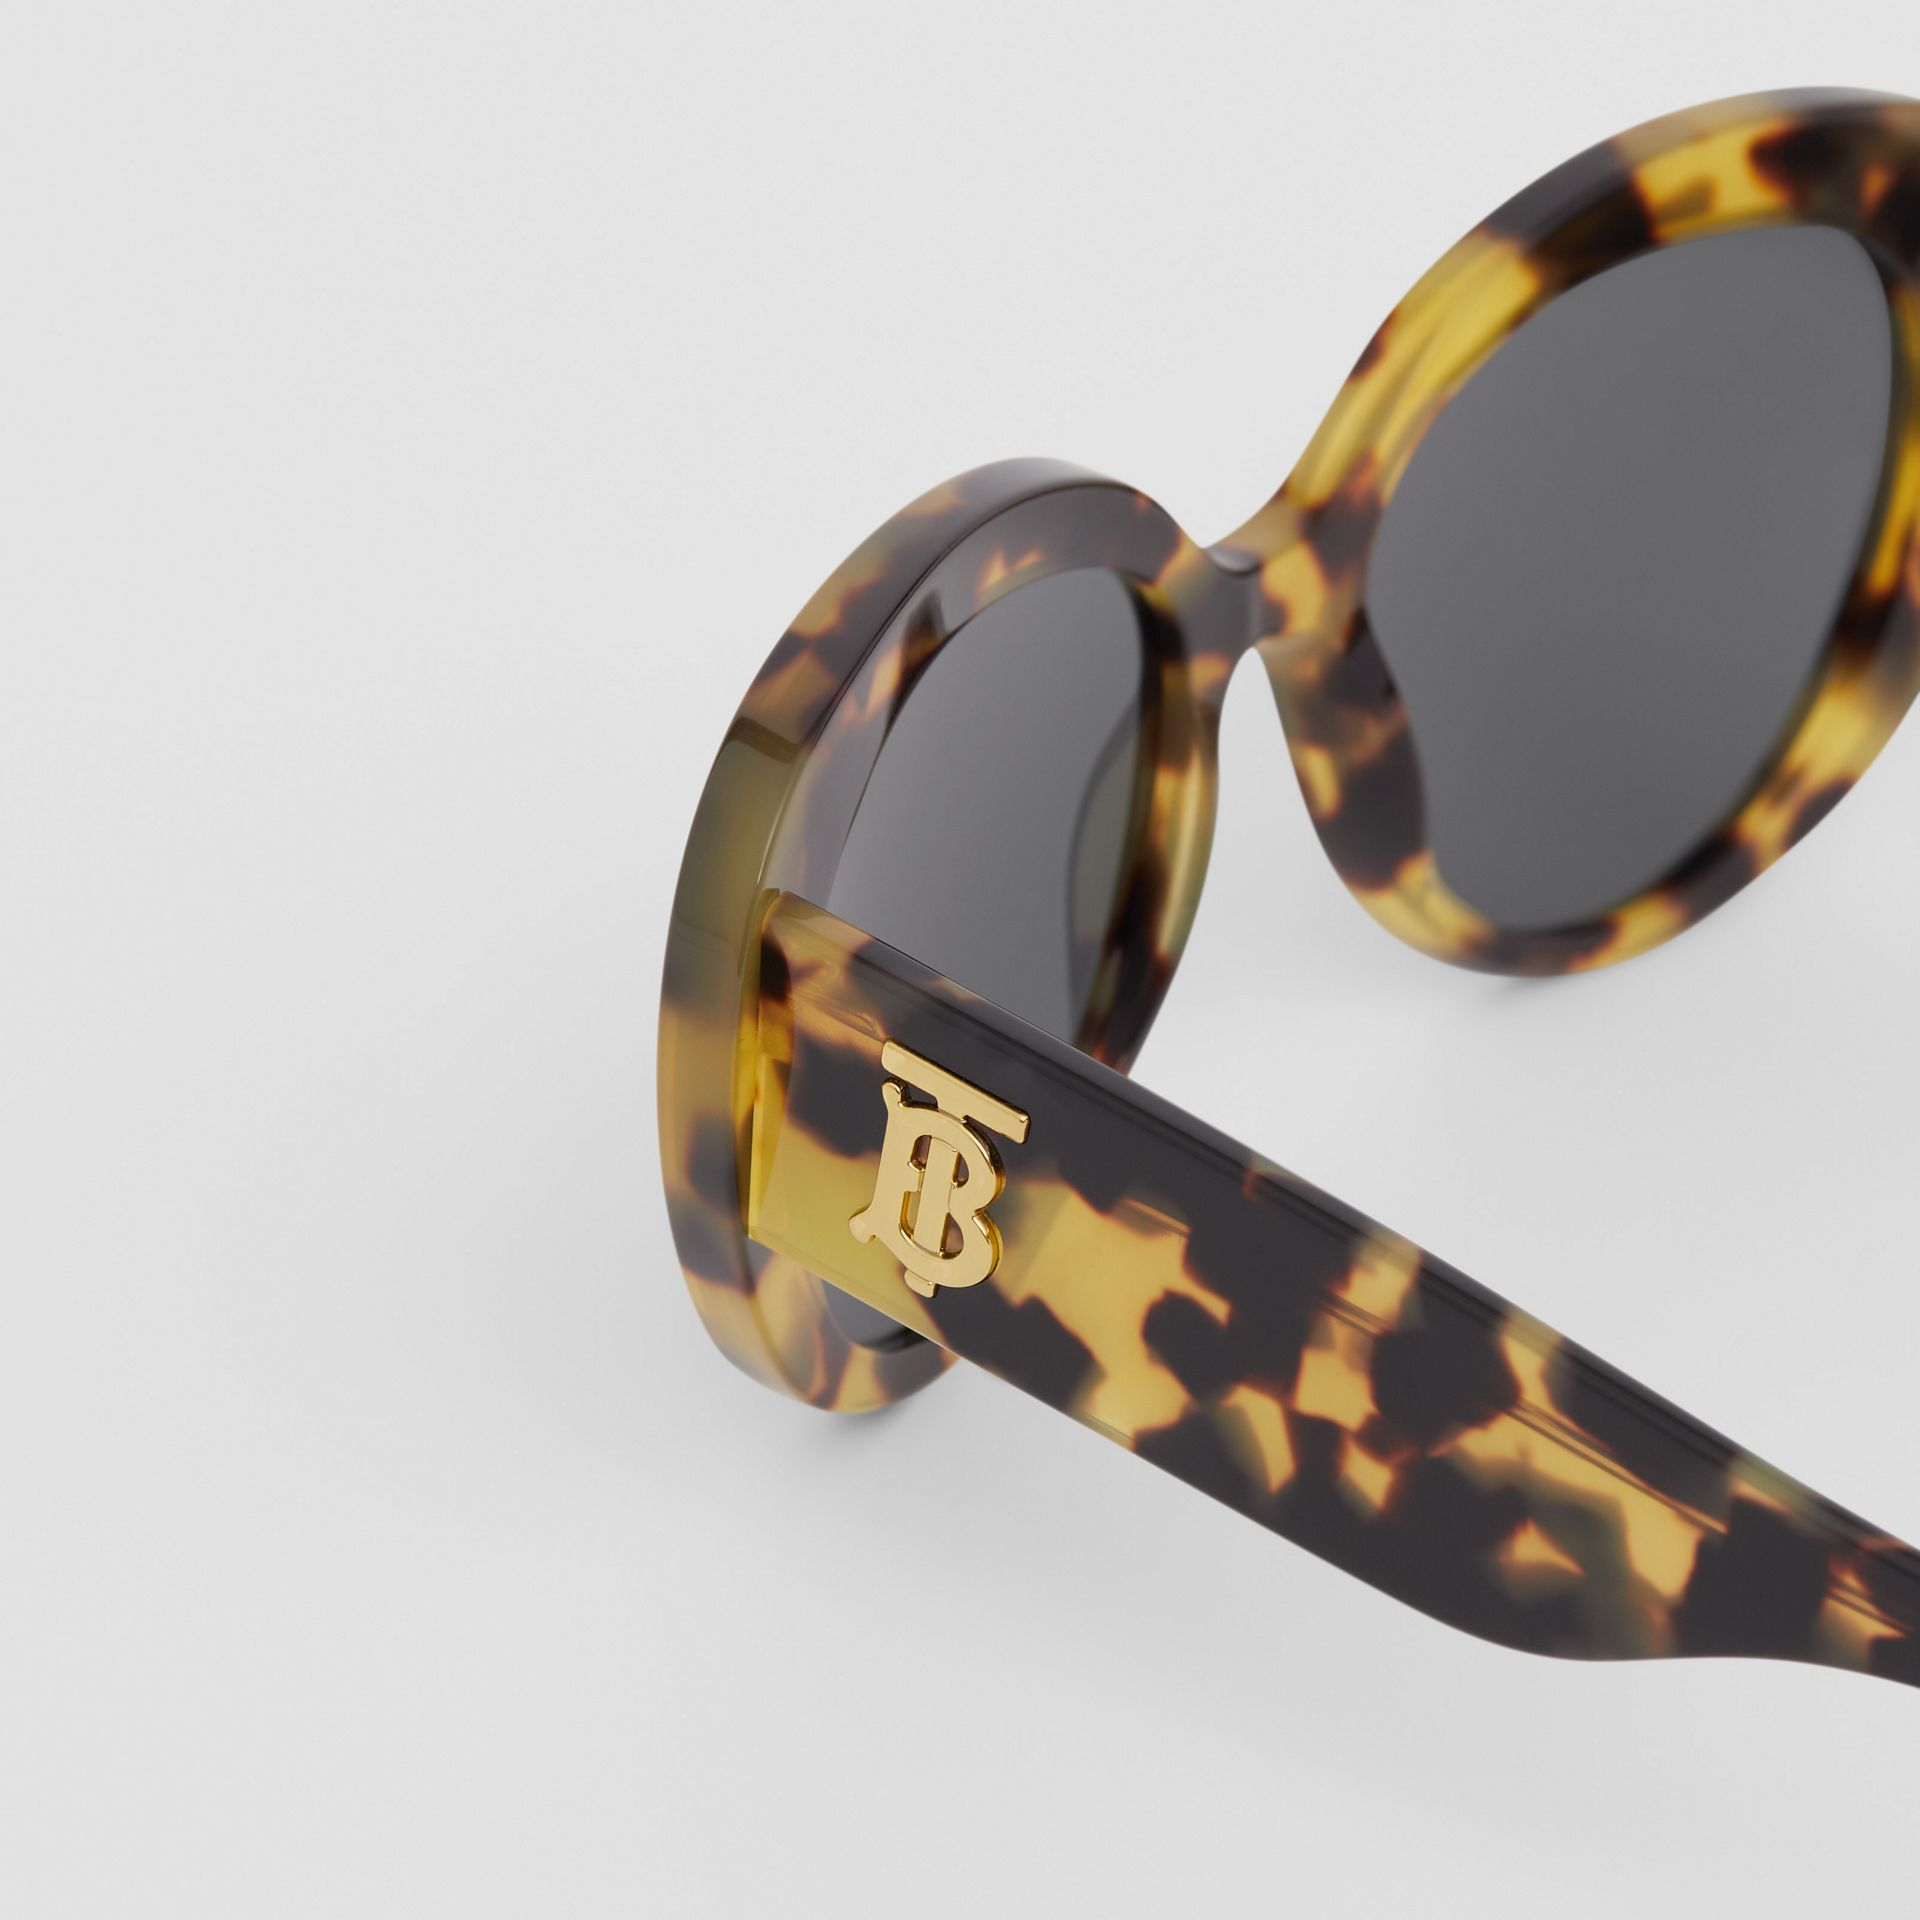 Monogram Motif Cat-eye Frame Sunglasses in Bright Tortoiseshell - Women | Burberry United Kingdom - gallery image 1